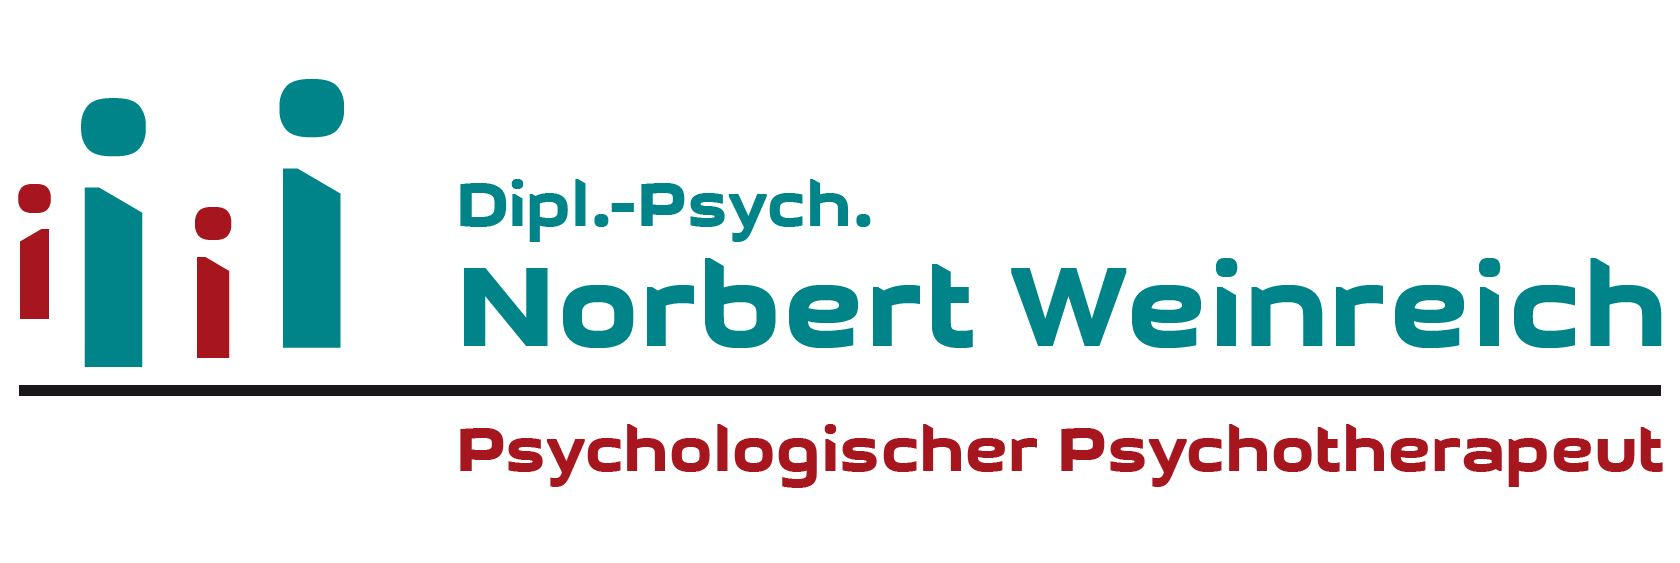 Psychotherapiepraxis Norbert Weinreich